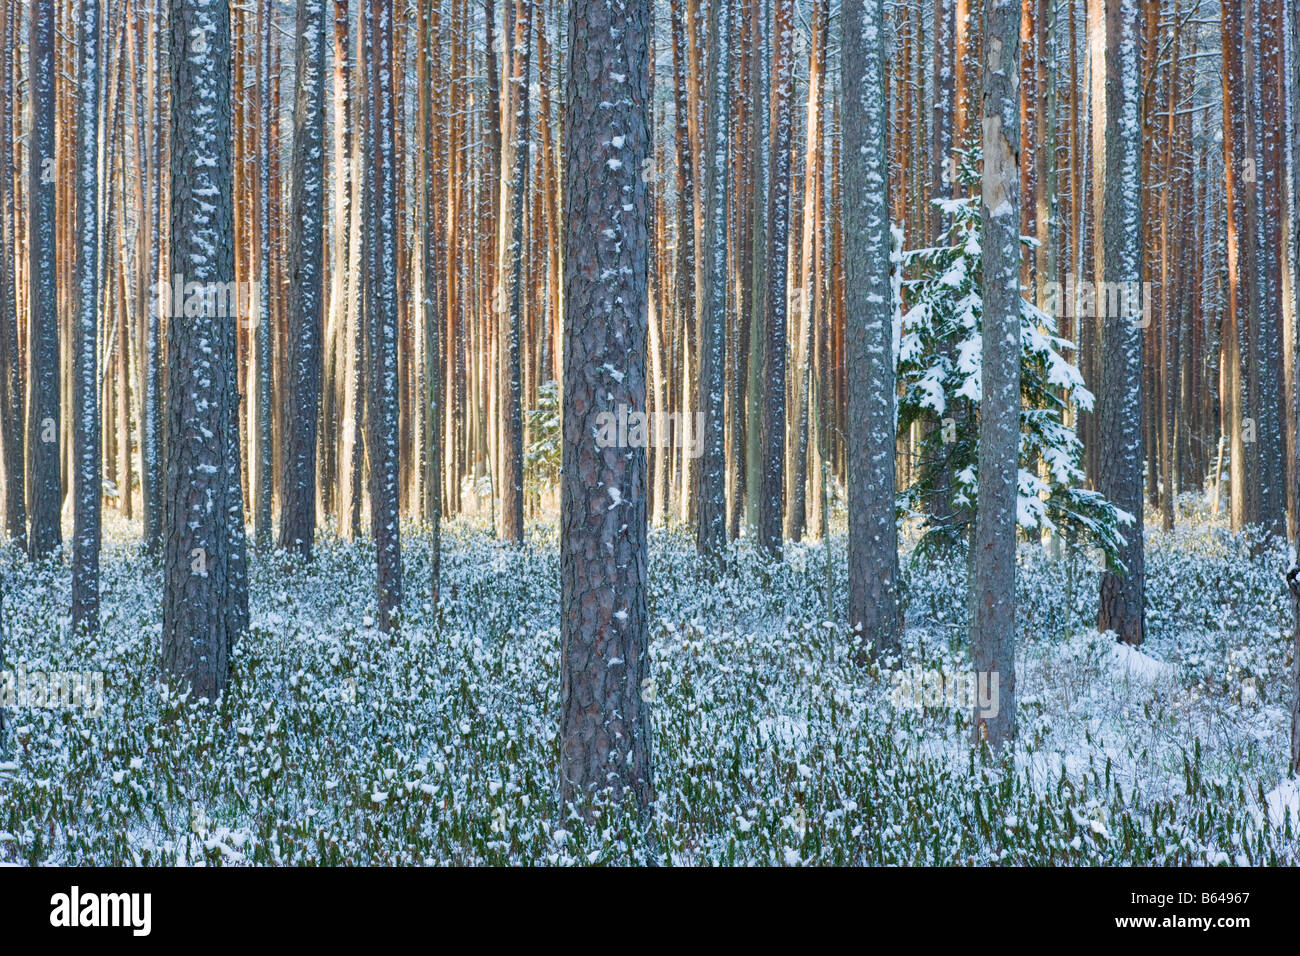 Scots pine woodland - Stock Image